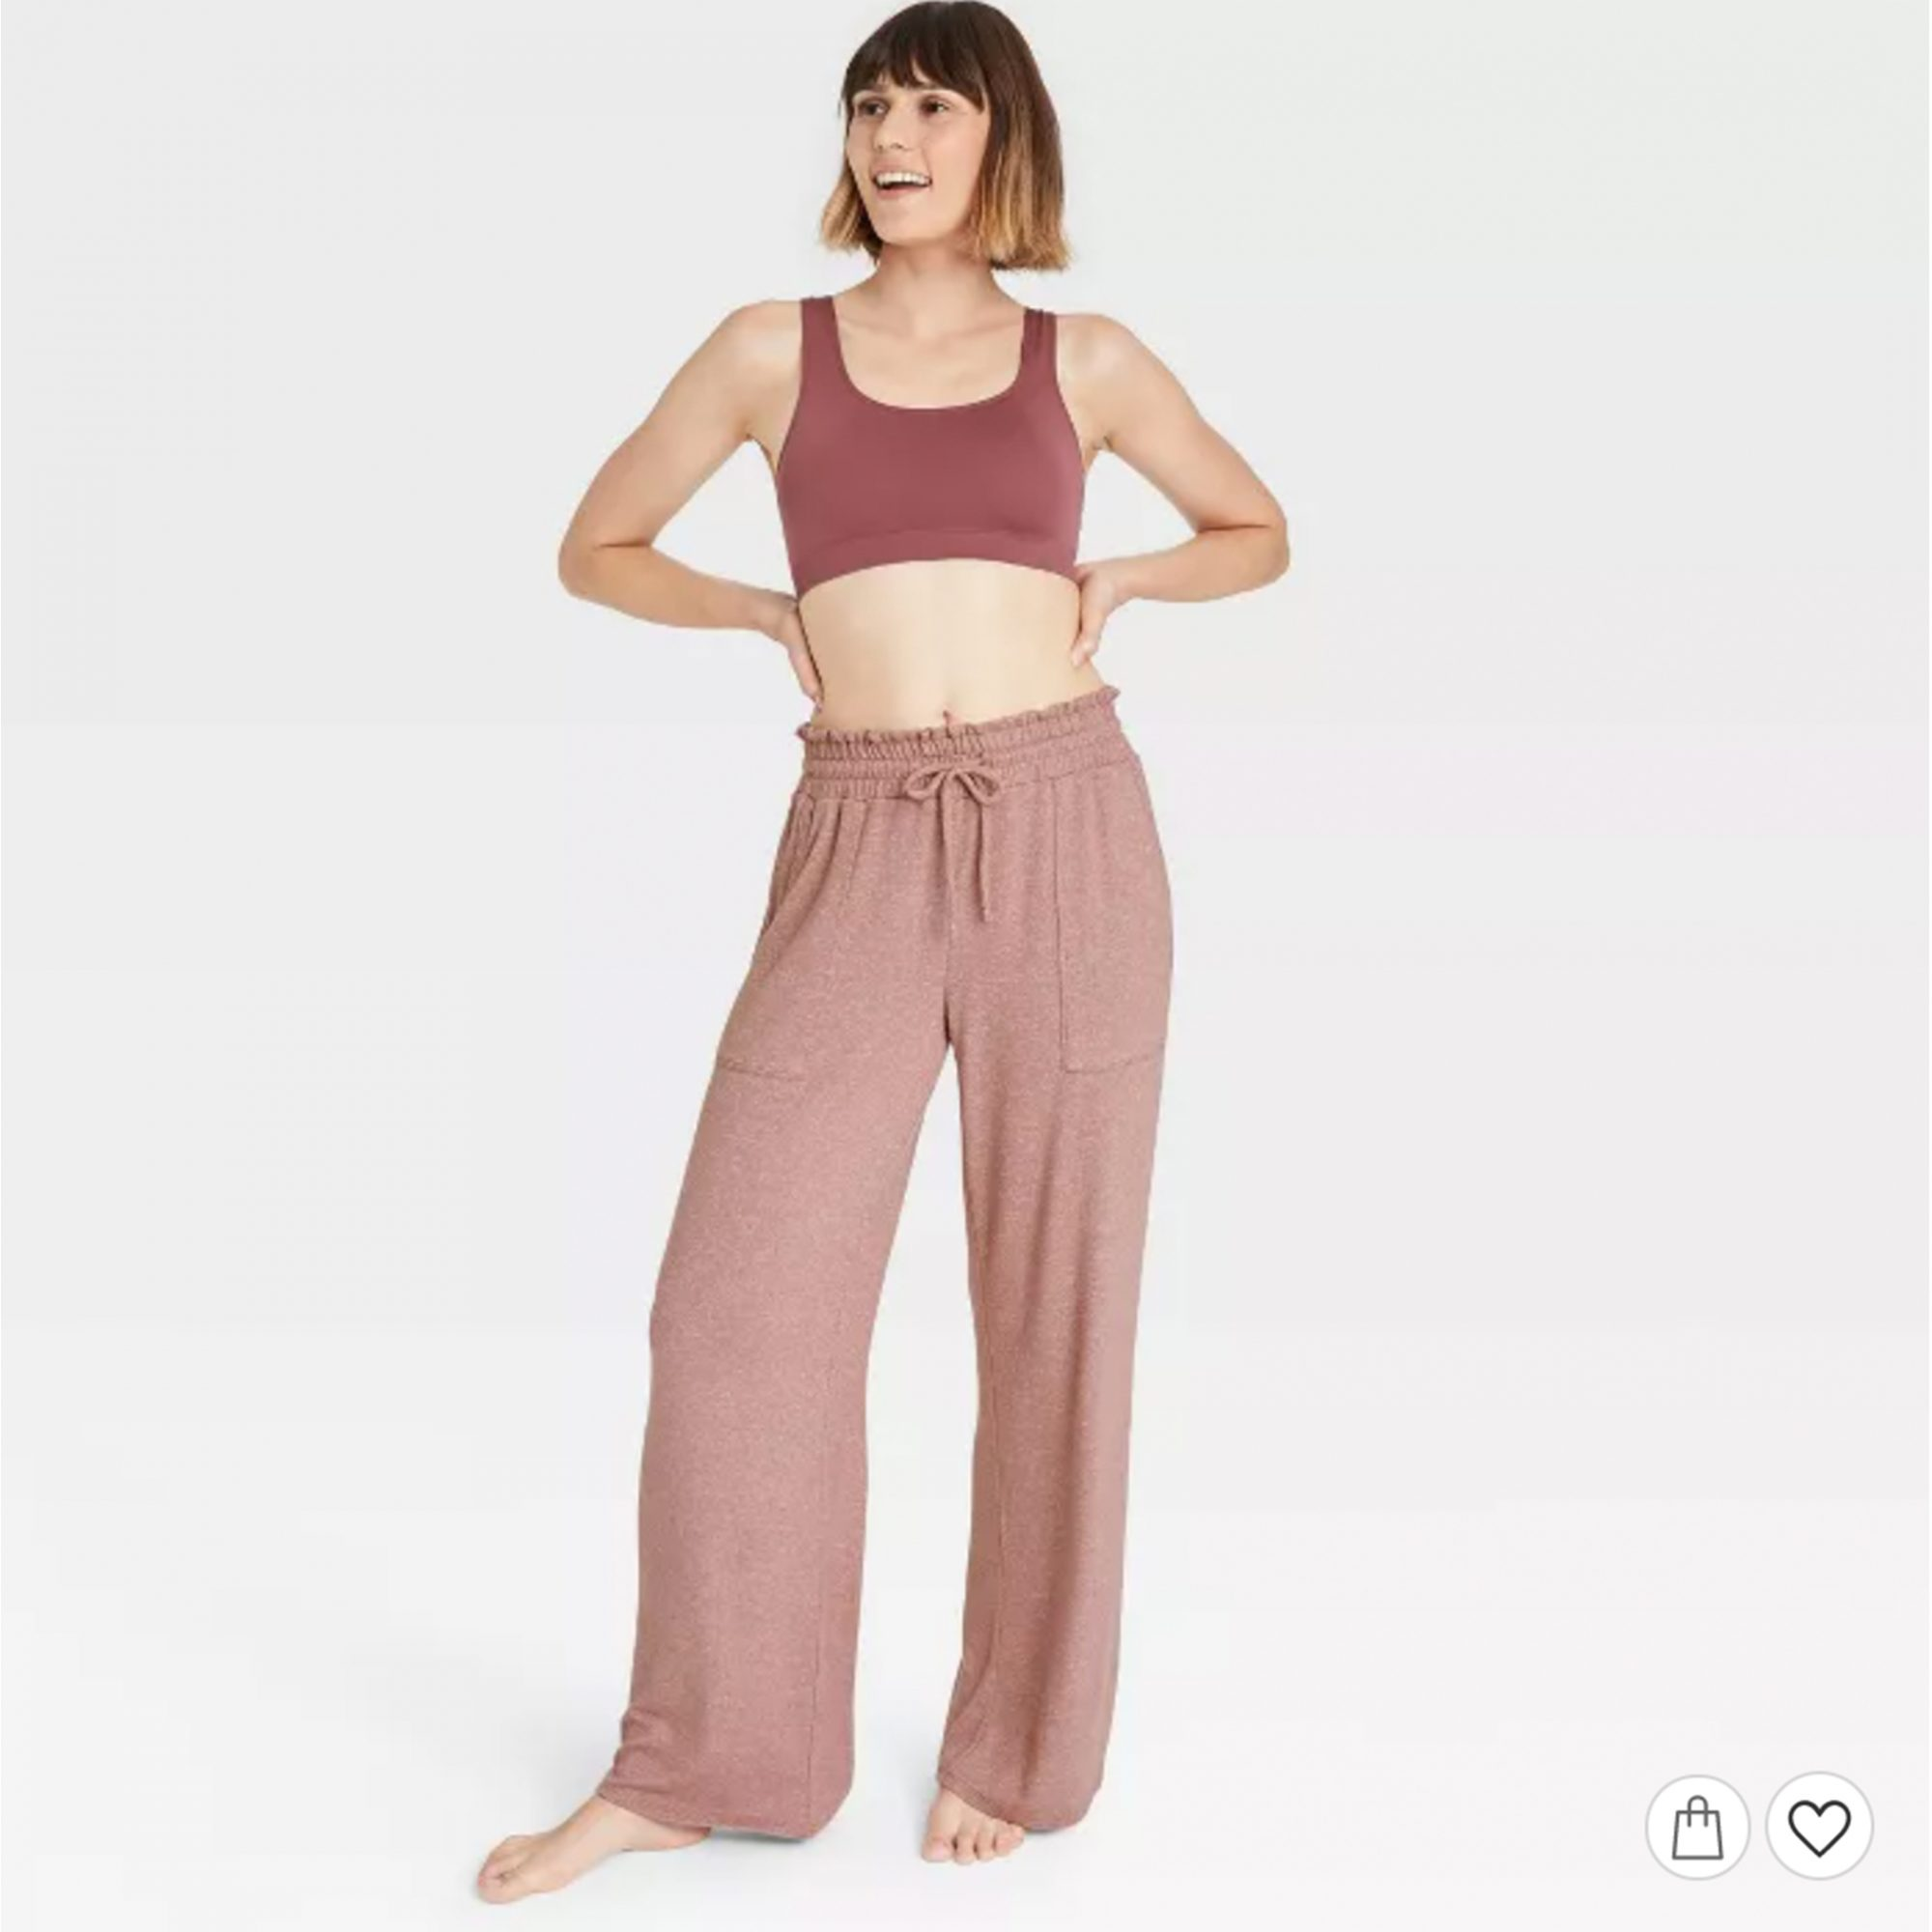 target-wide-leg-pants